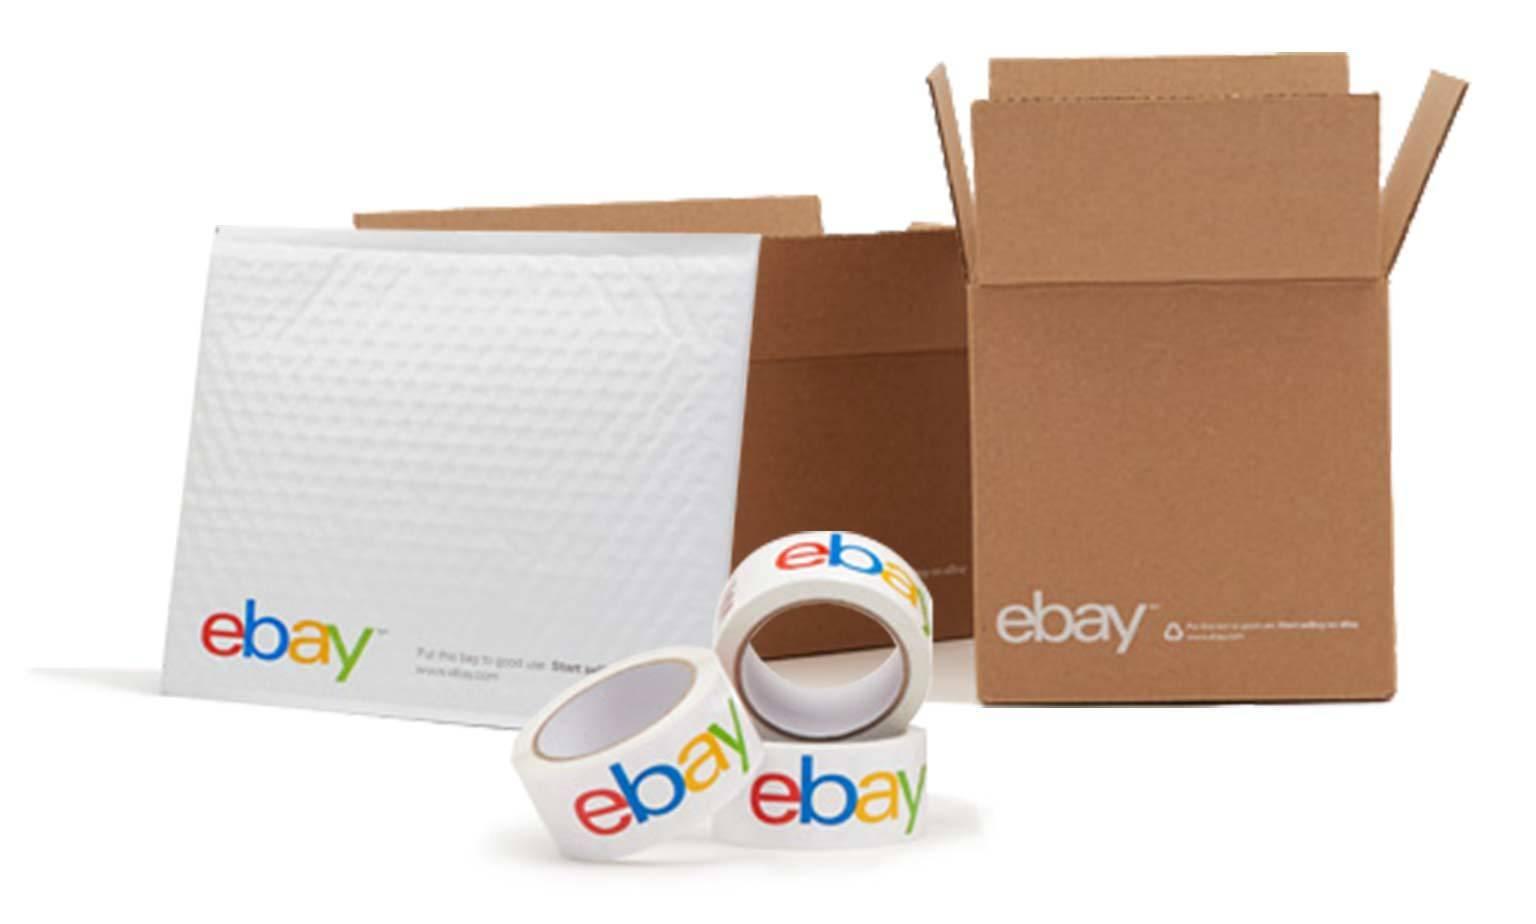 eBay Shipping Supplies